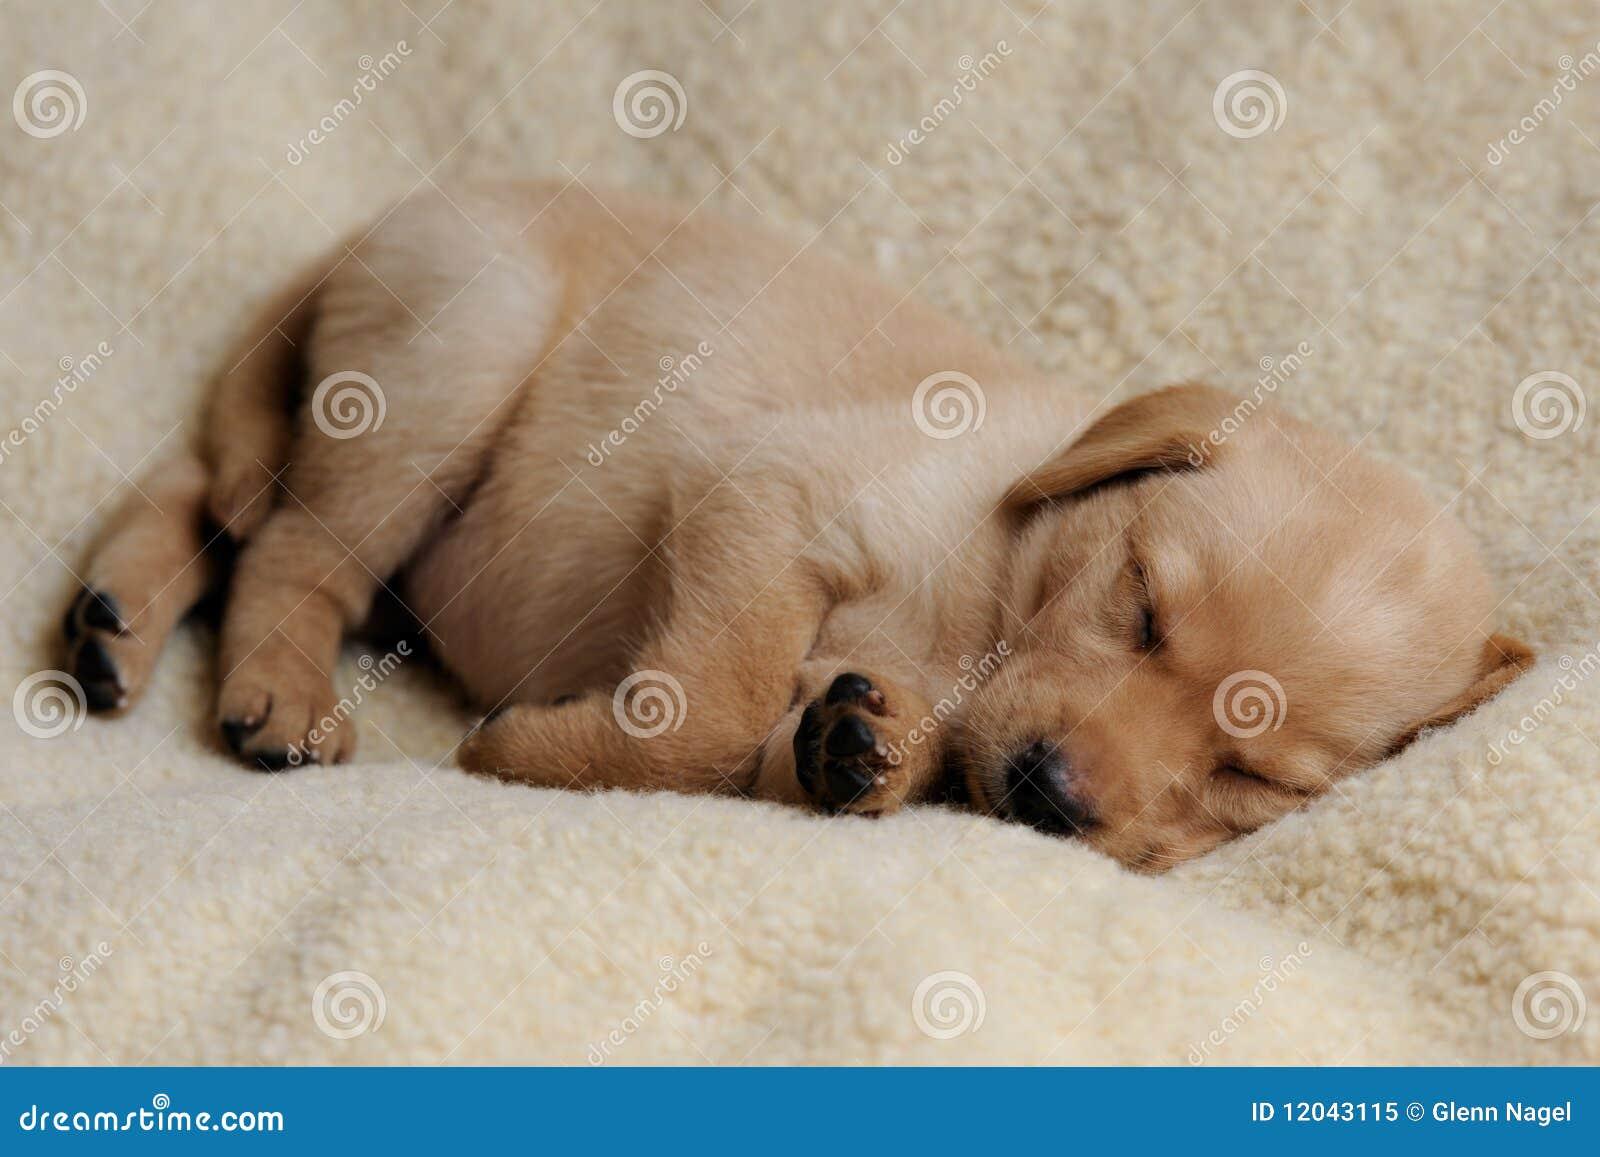 yellow lab puppy sleeping - photo #17